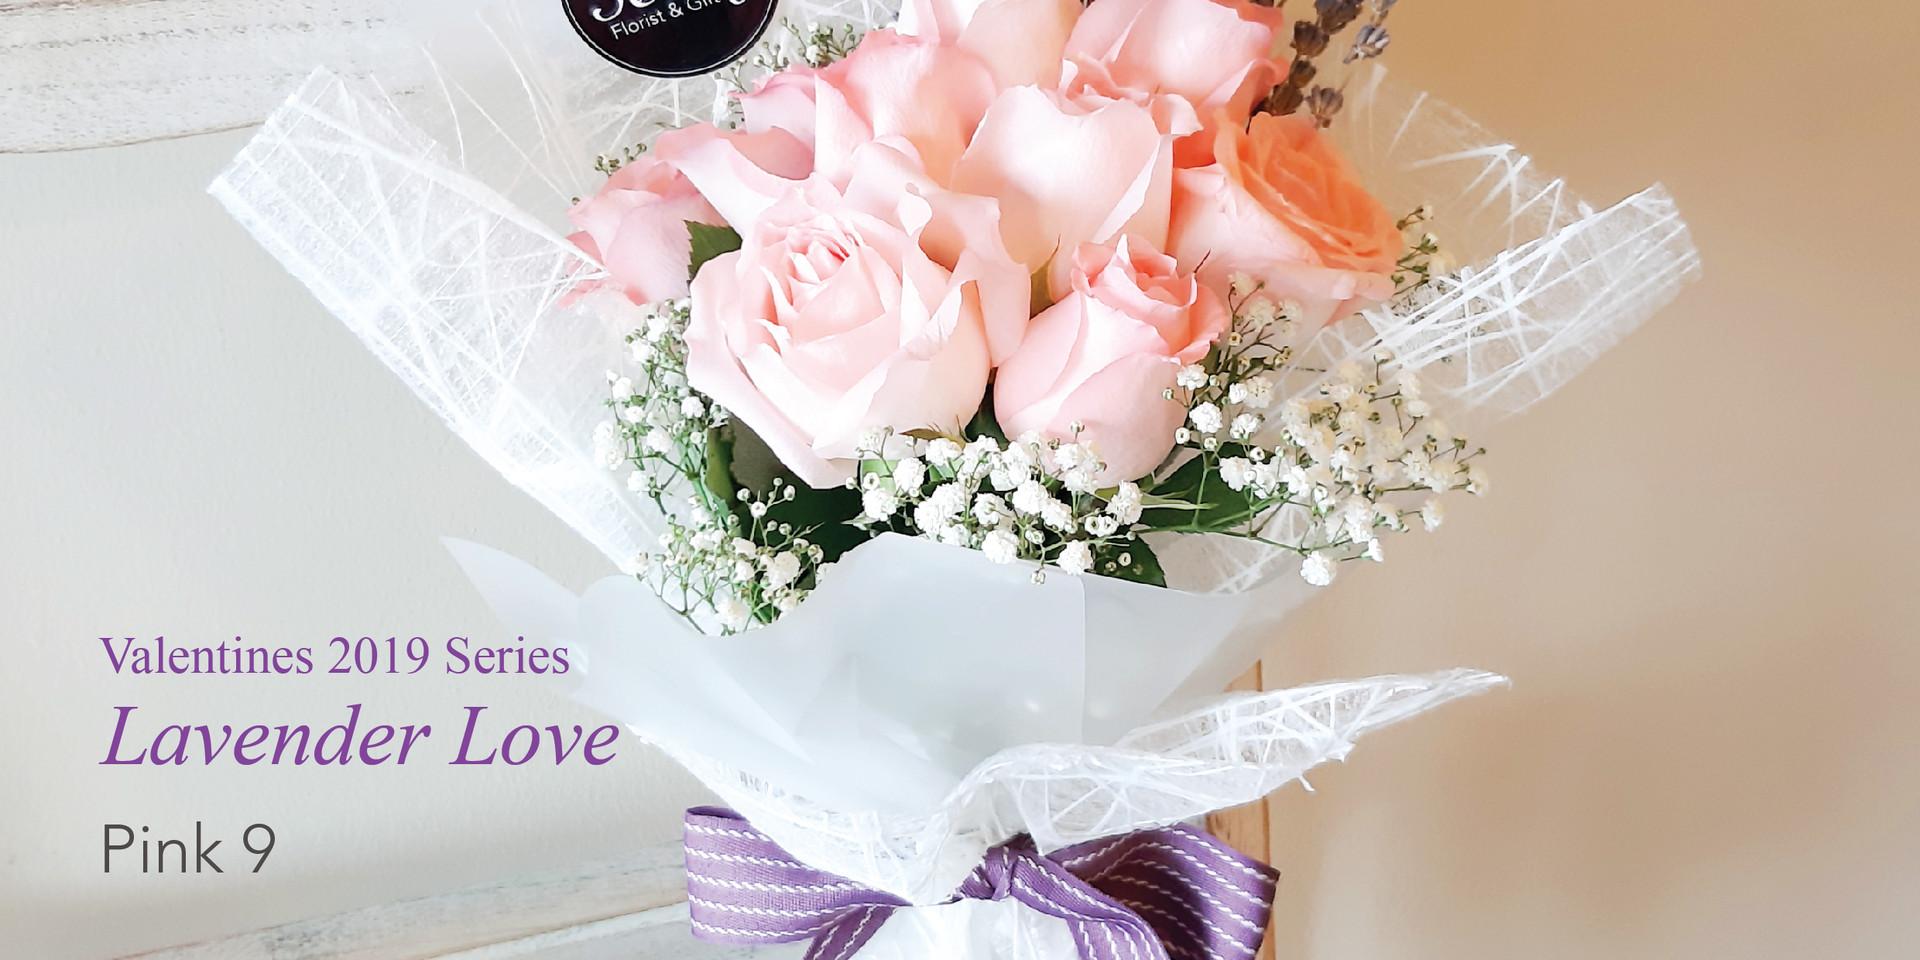 Pink 9-Lavender Love 2019-01.jpg